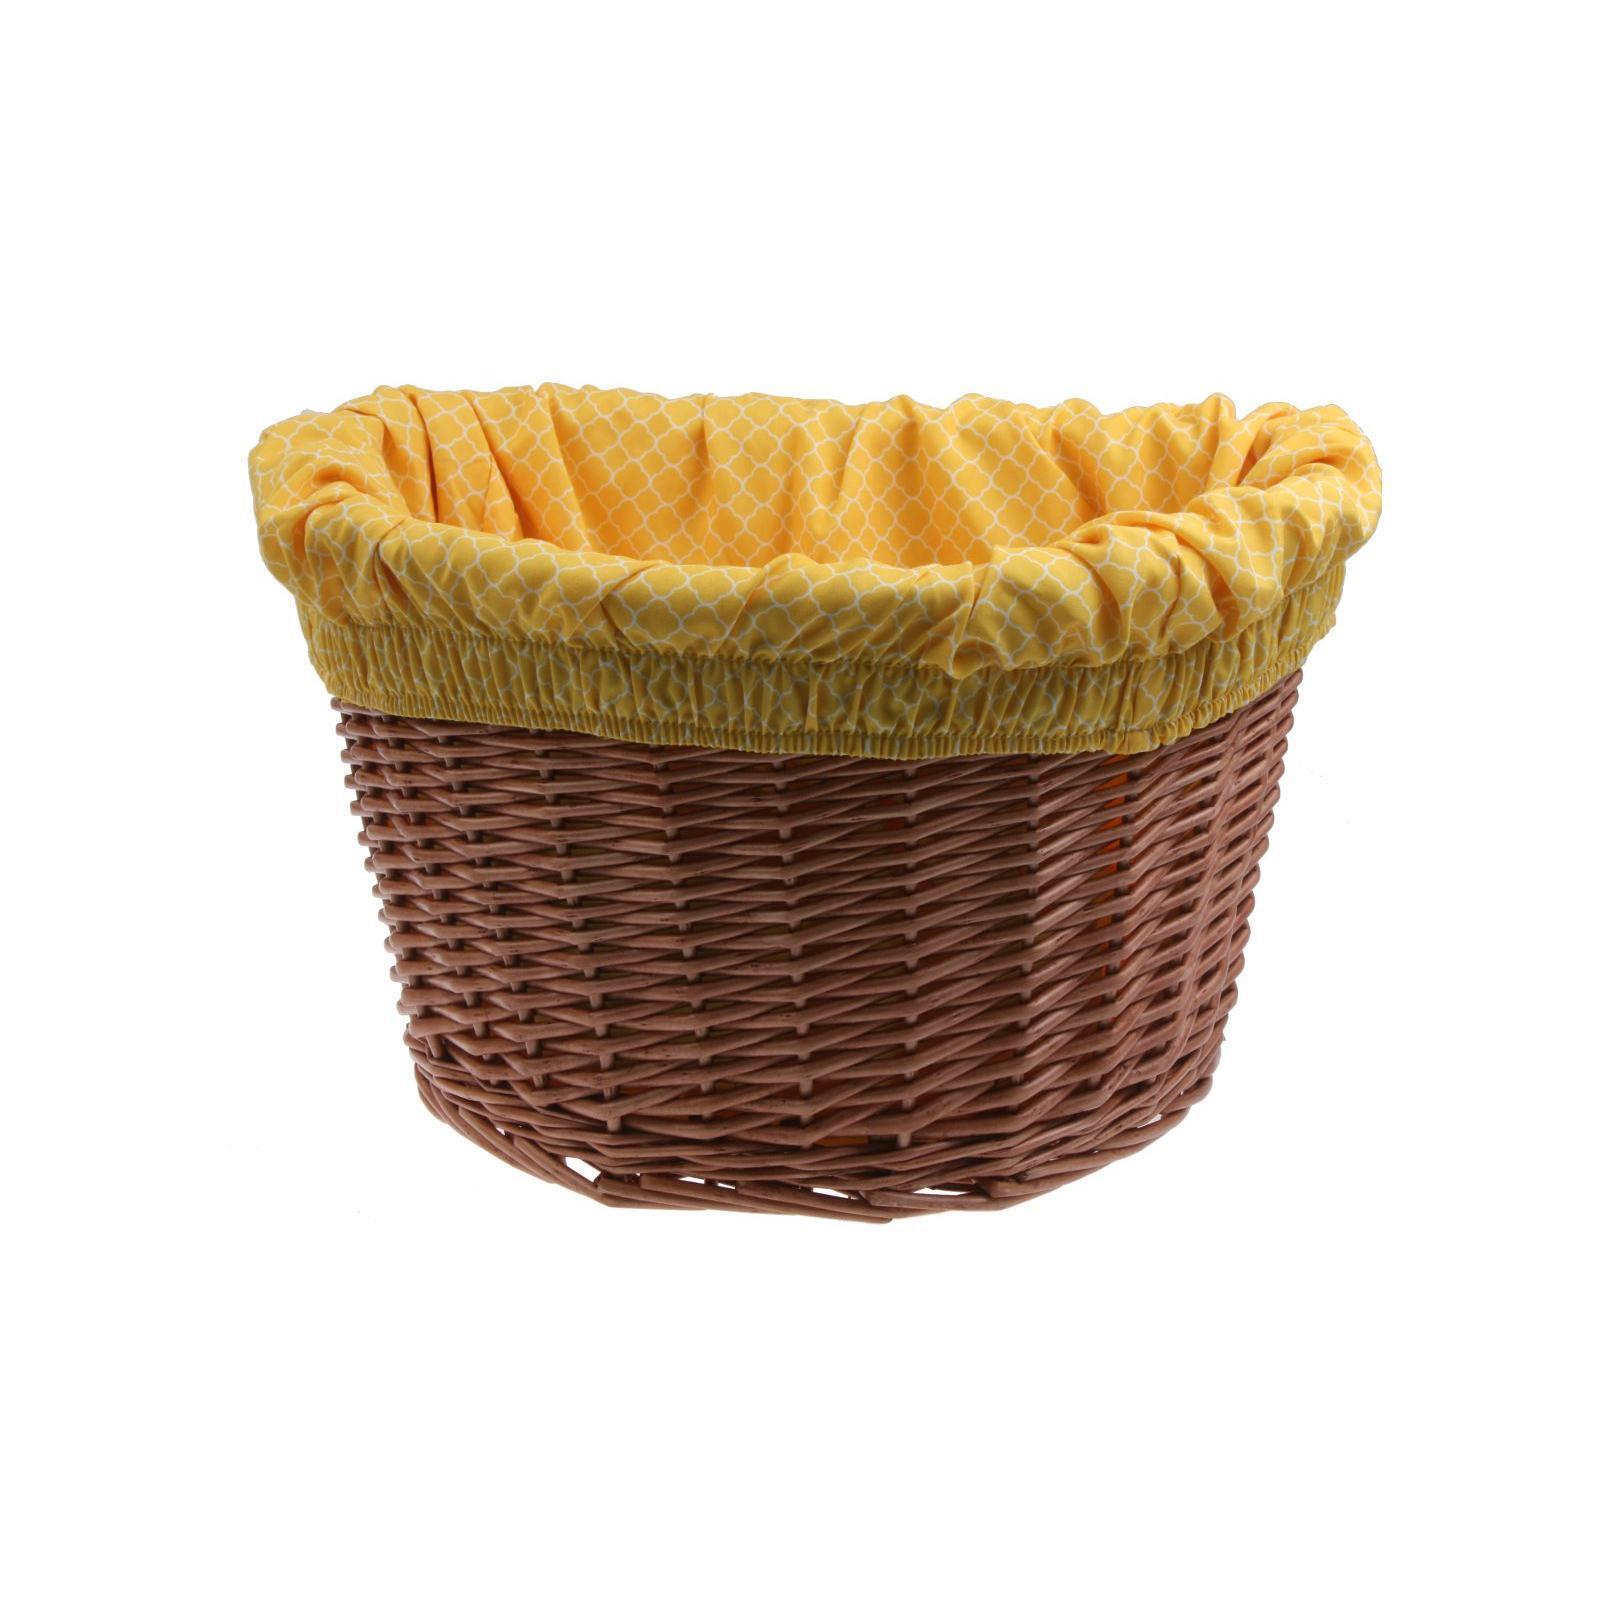 Electra bicicleta pastos cesta Wicker con bolso amarillo blancoo Basket Liner cesta uso